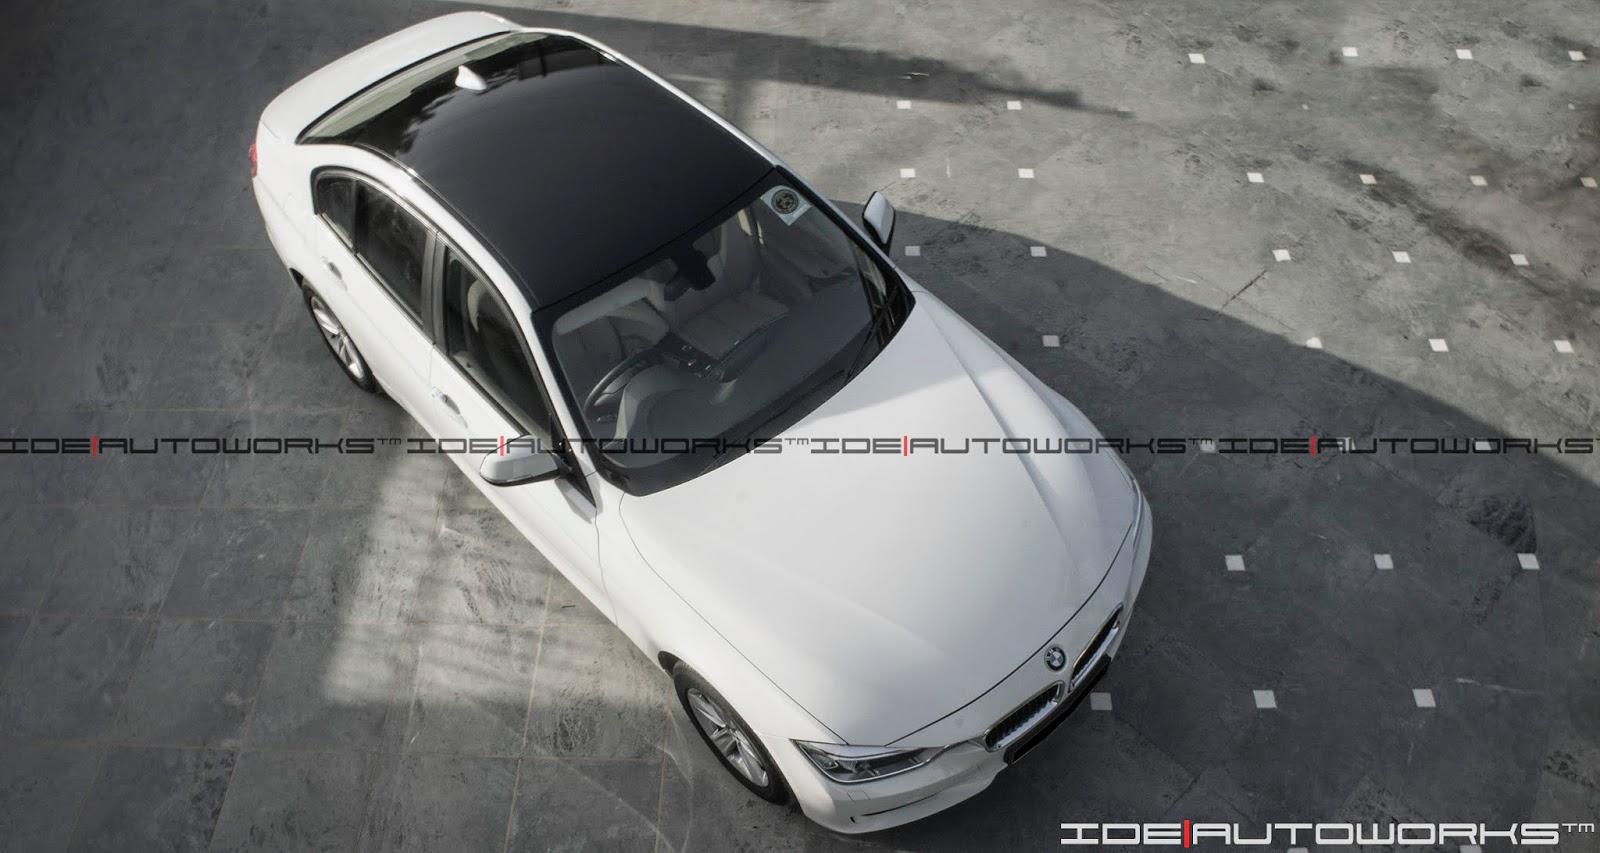 Bmw 320d F30 Ide Autoworks